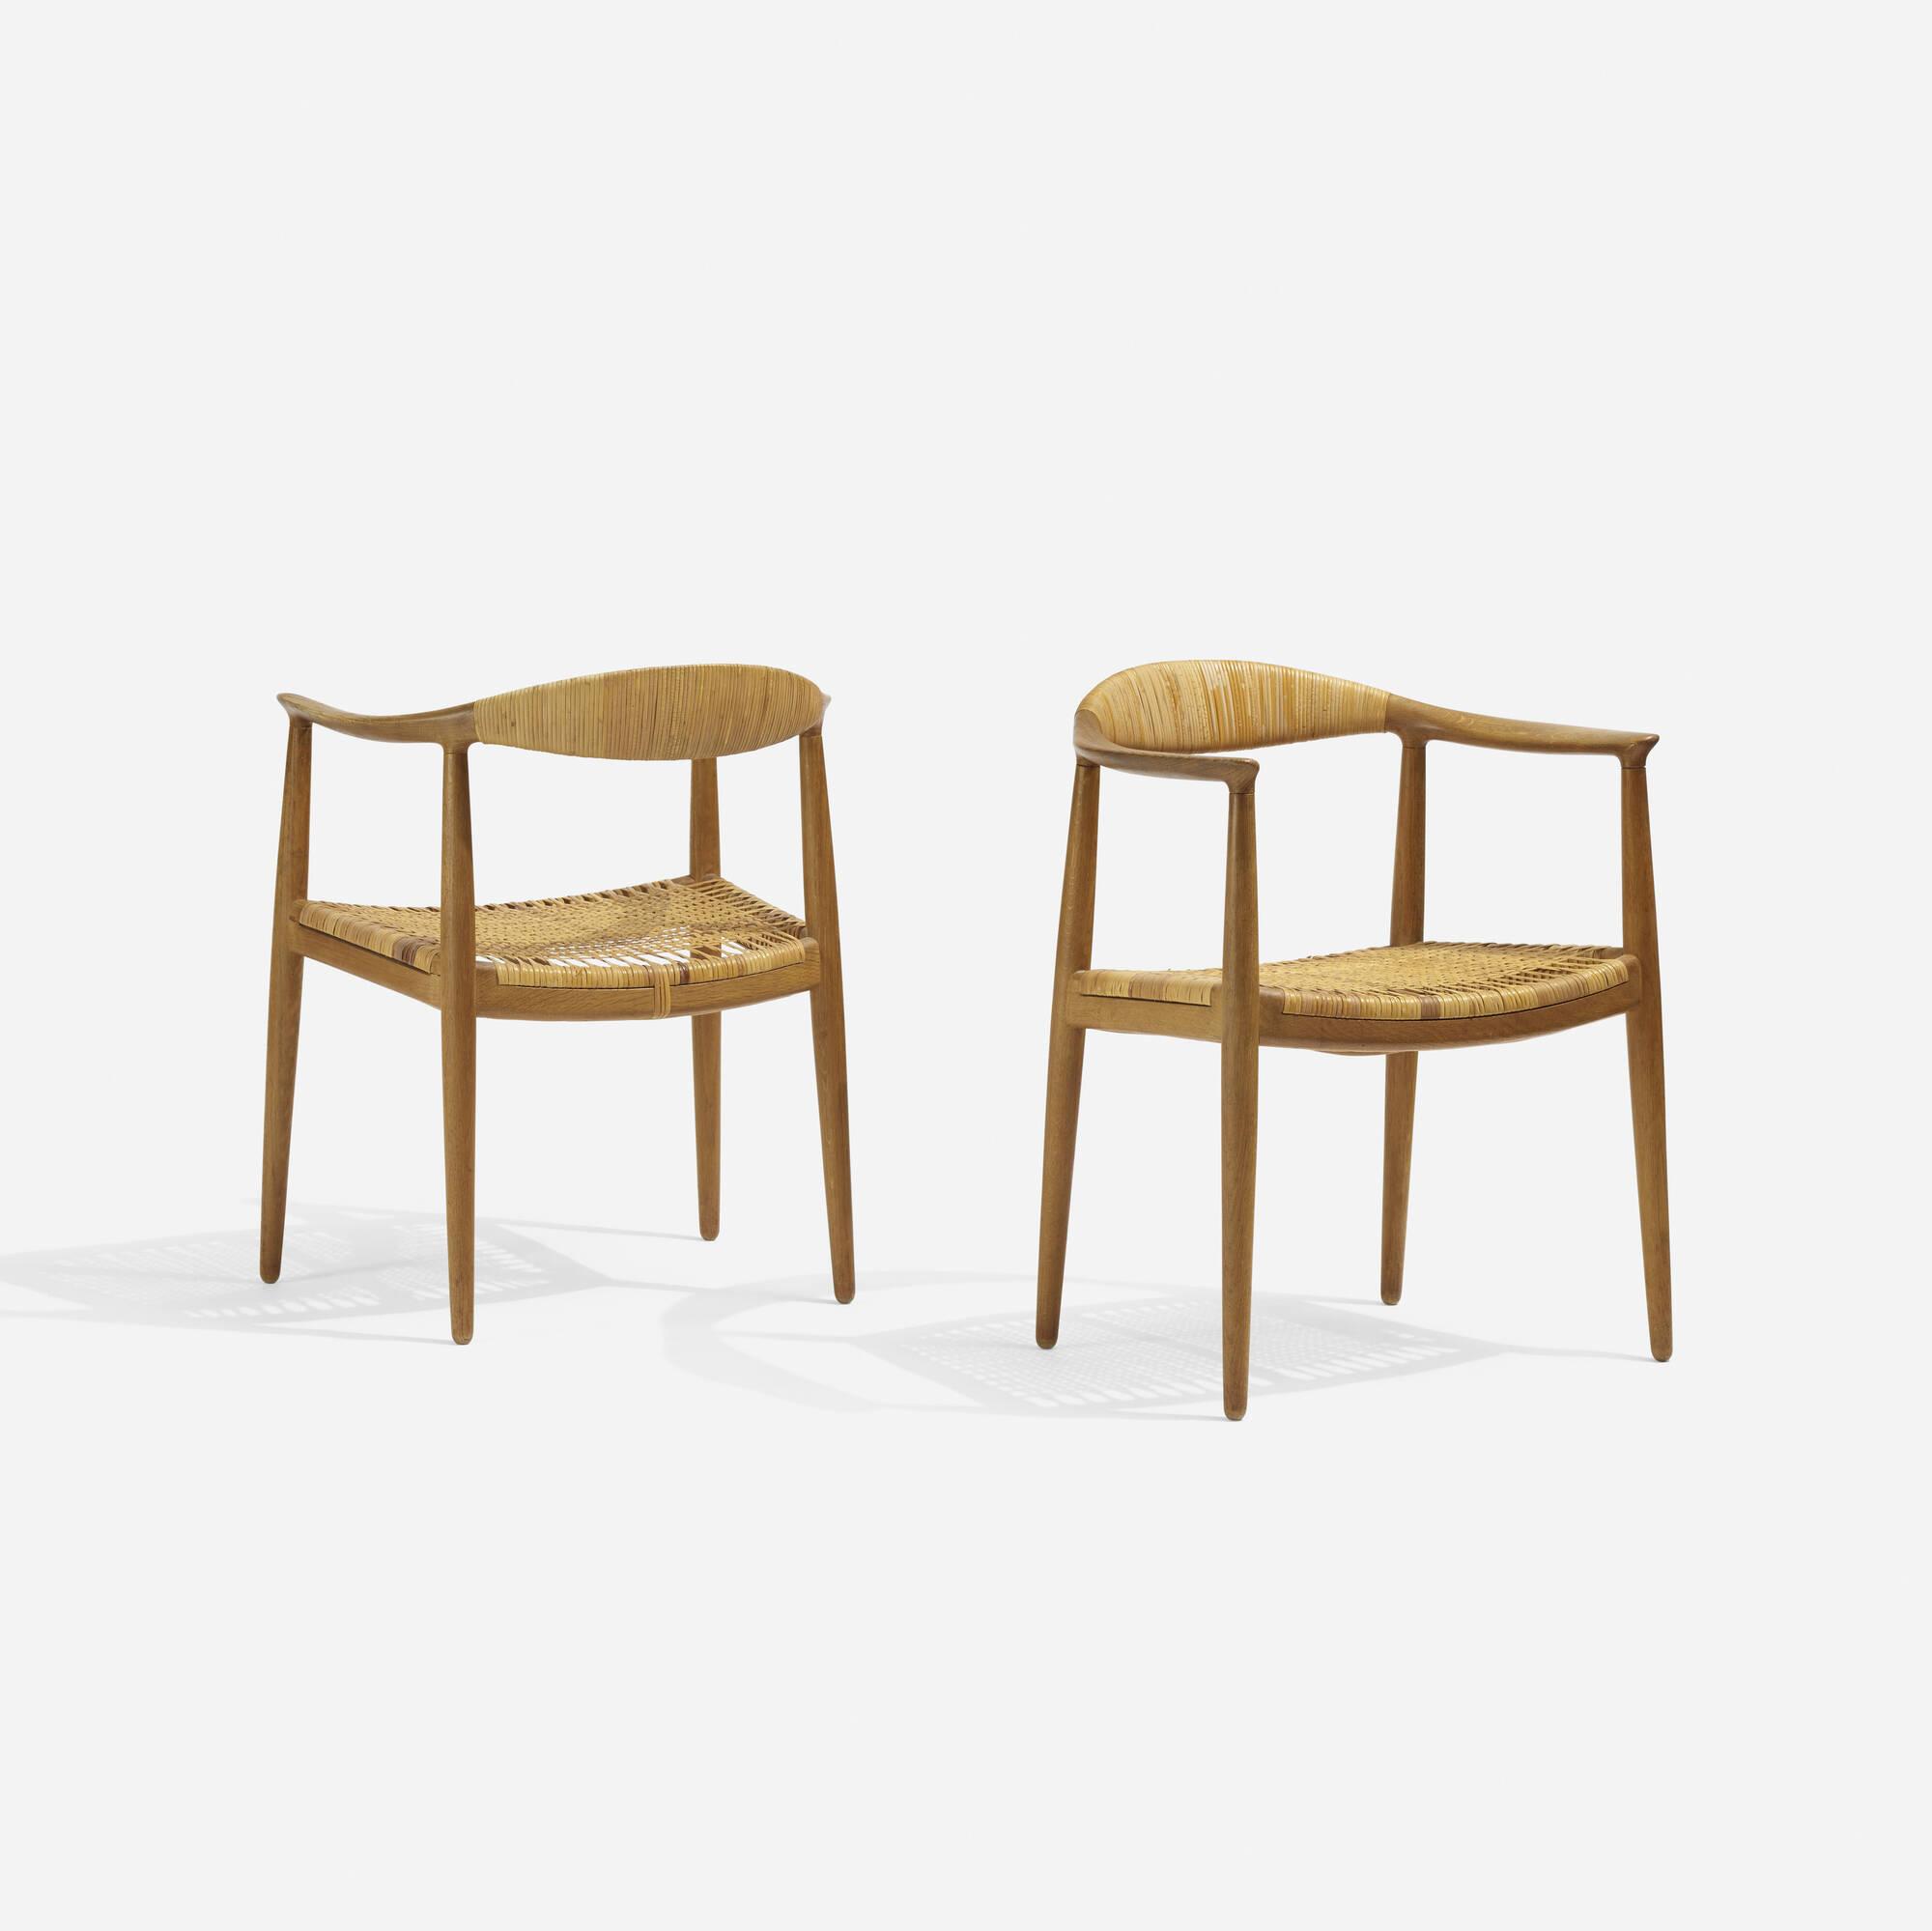 316: Hans J. Wegner / The Chairs, pair (2 of 3)